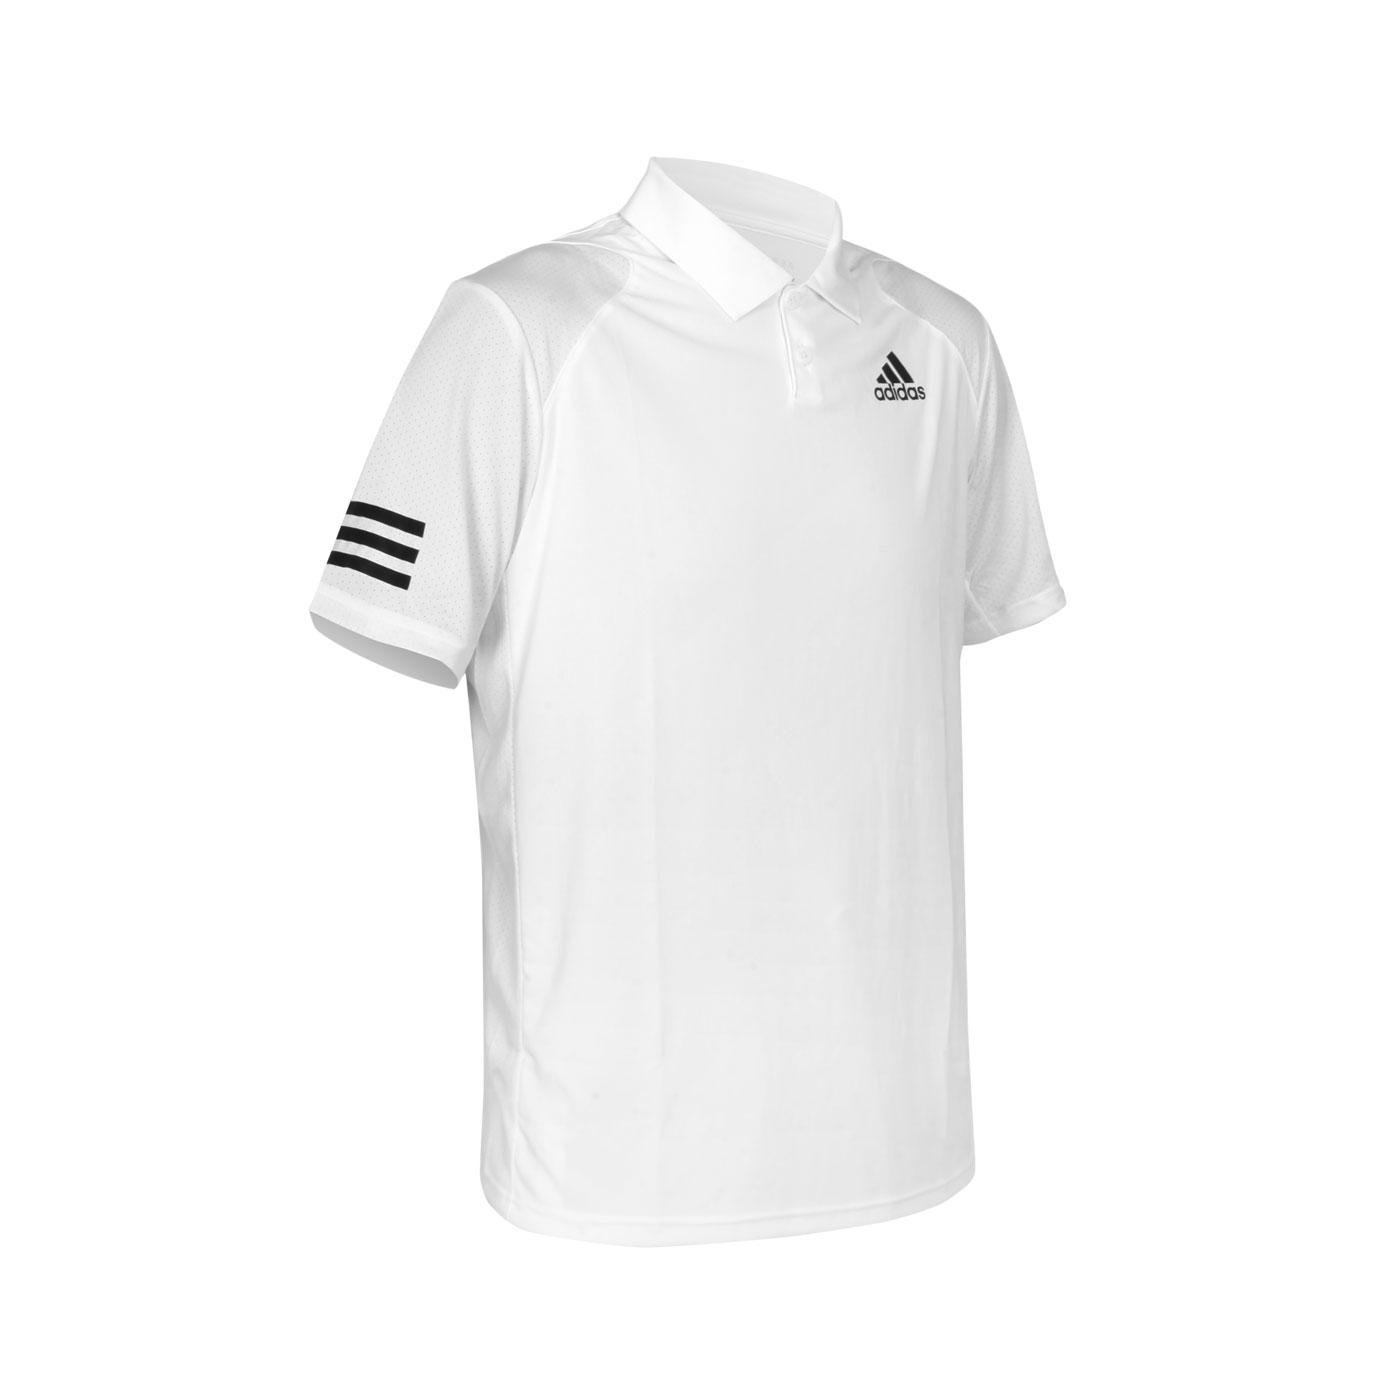 ADIDAS 男款短袖POLO衫 GL5416 - 白黑